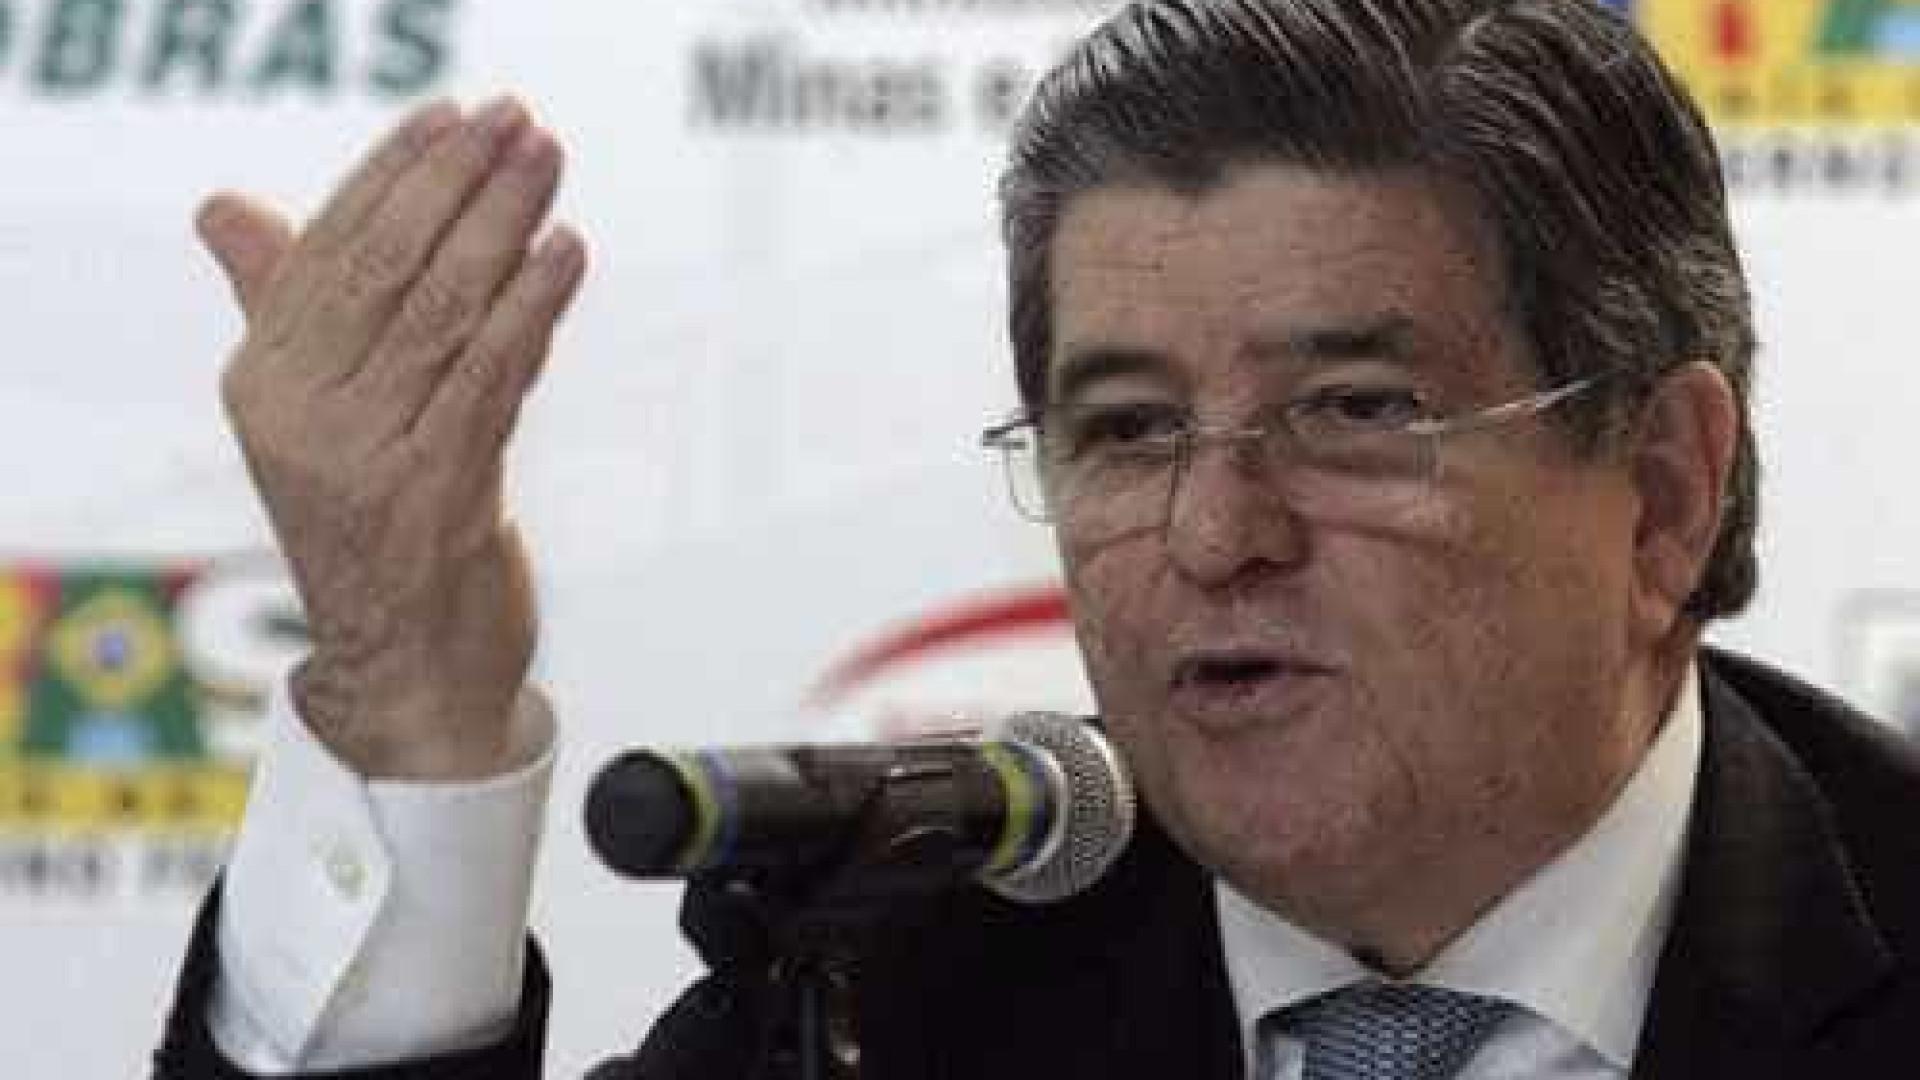 Machado diz ter repassado propina a 18 políticos de seis partidos